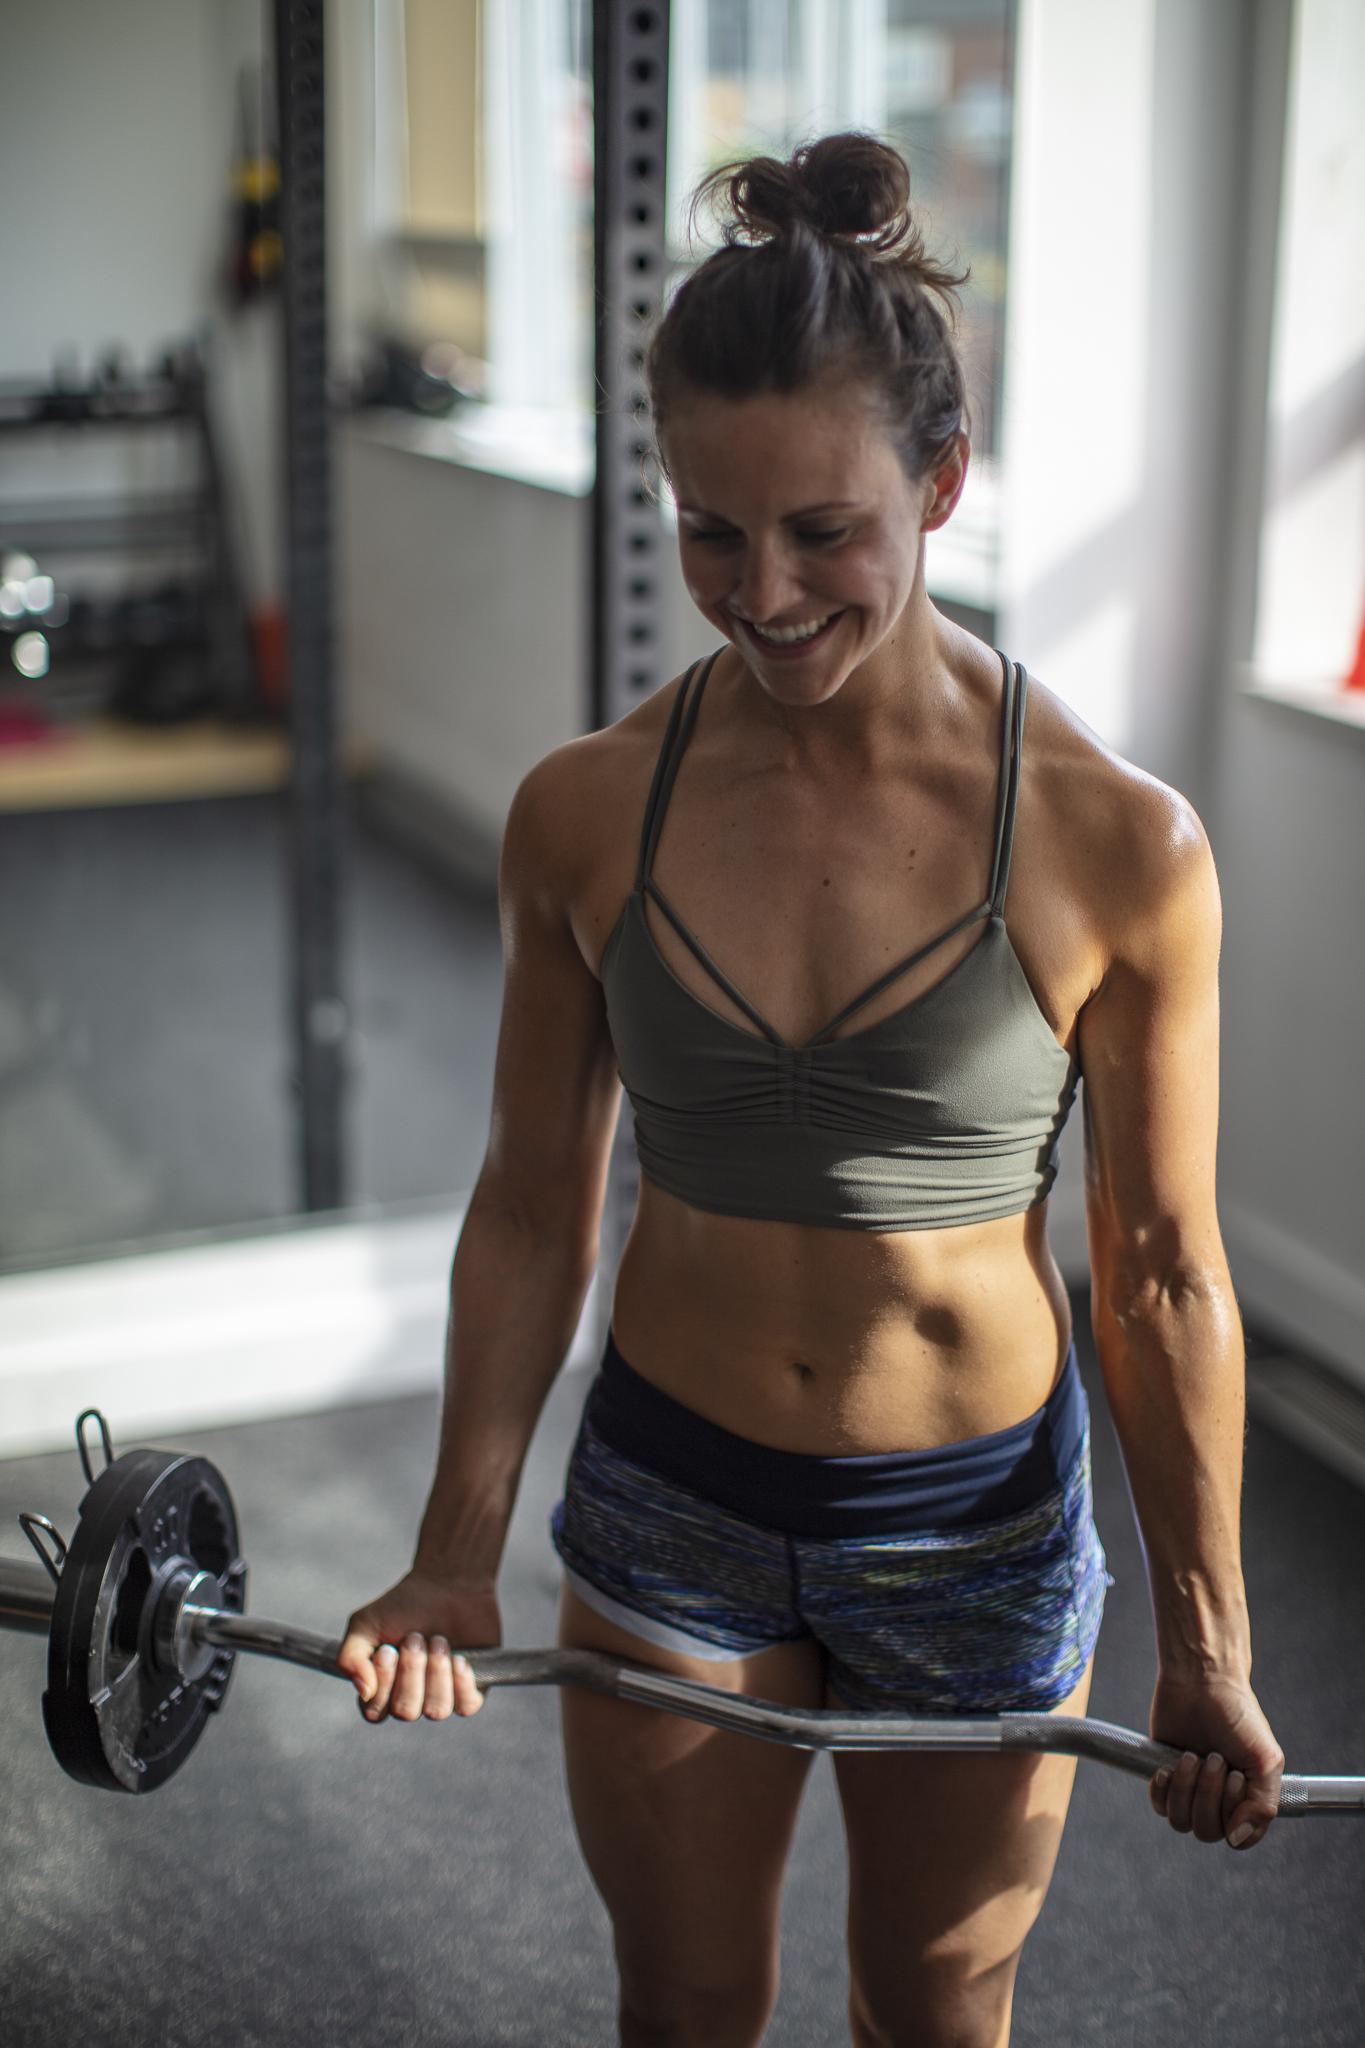 Sara Boyd - Fitness Coach - UvU Fitness - Reduced Edits - 09 Jun '19 - 08.JPG